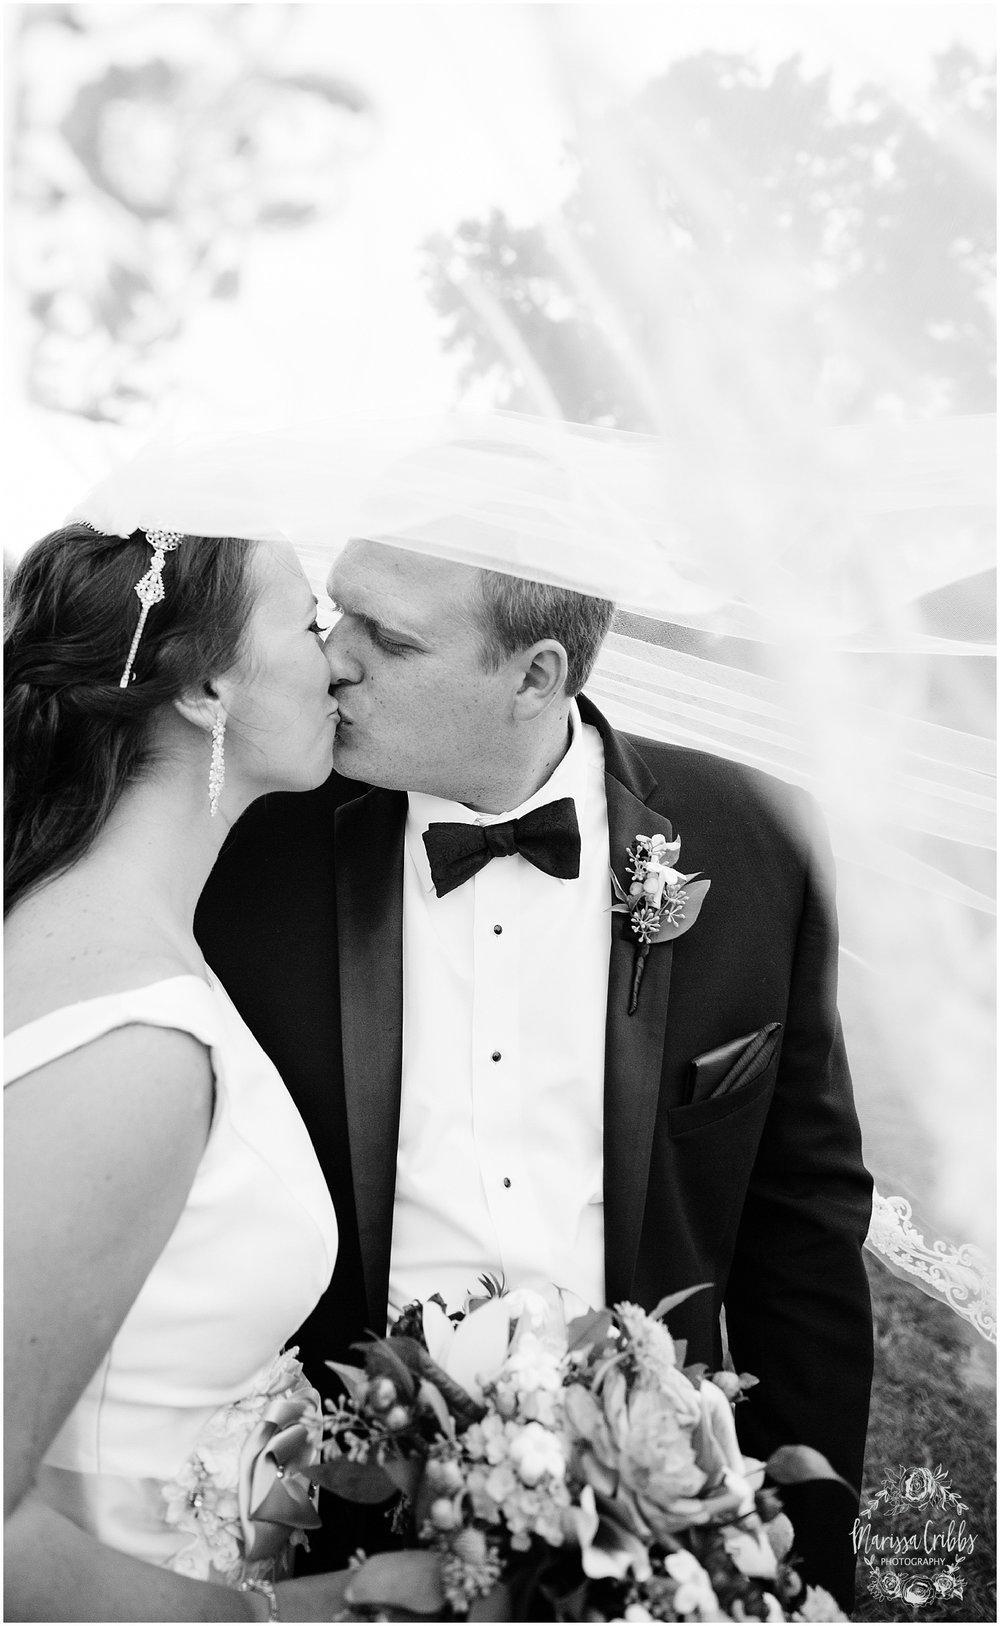 Blue Hills Country Club Wedding | Marissa Cribbs Photography | Nolte's Bridal | KC Wedding Photographer | KC Weddings_1192.jpg